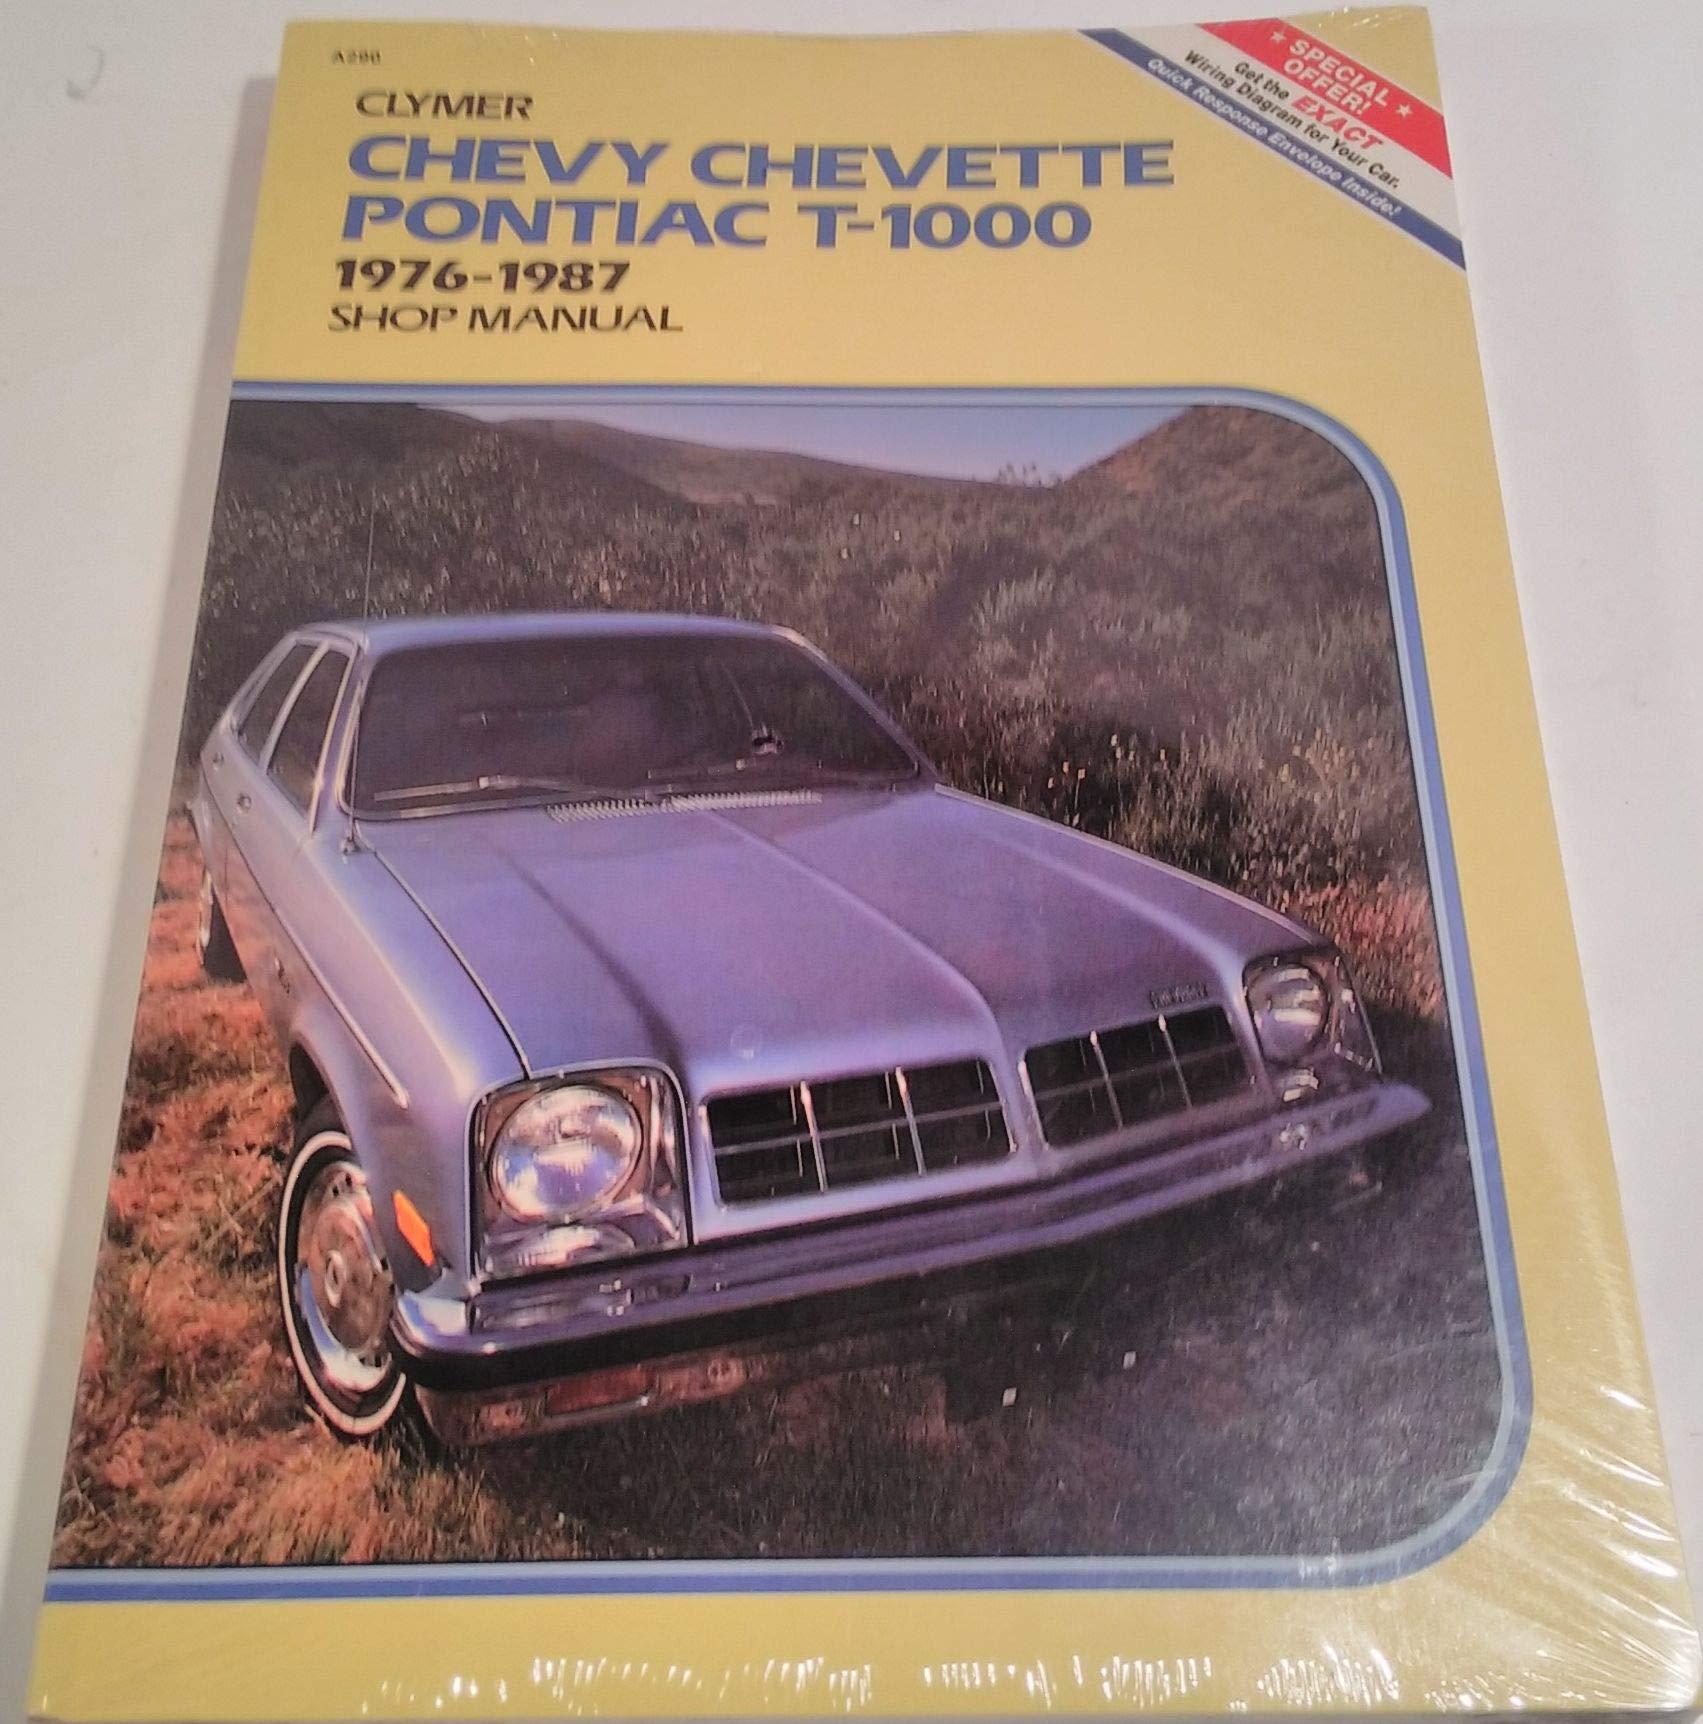 Chevy Chevette, Pontiac T-1000, 1976-1987 Gas & Diesel: Shop Manual/Pbn  A290: Alan Ahlstrand, Jorgense, Kalton C. Lahue: 9780892871452: Books -  Amazon.ca